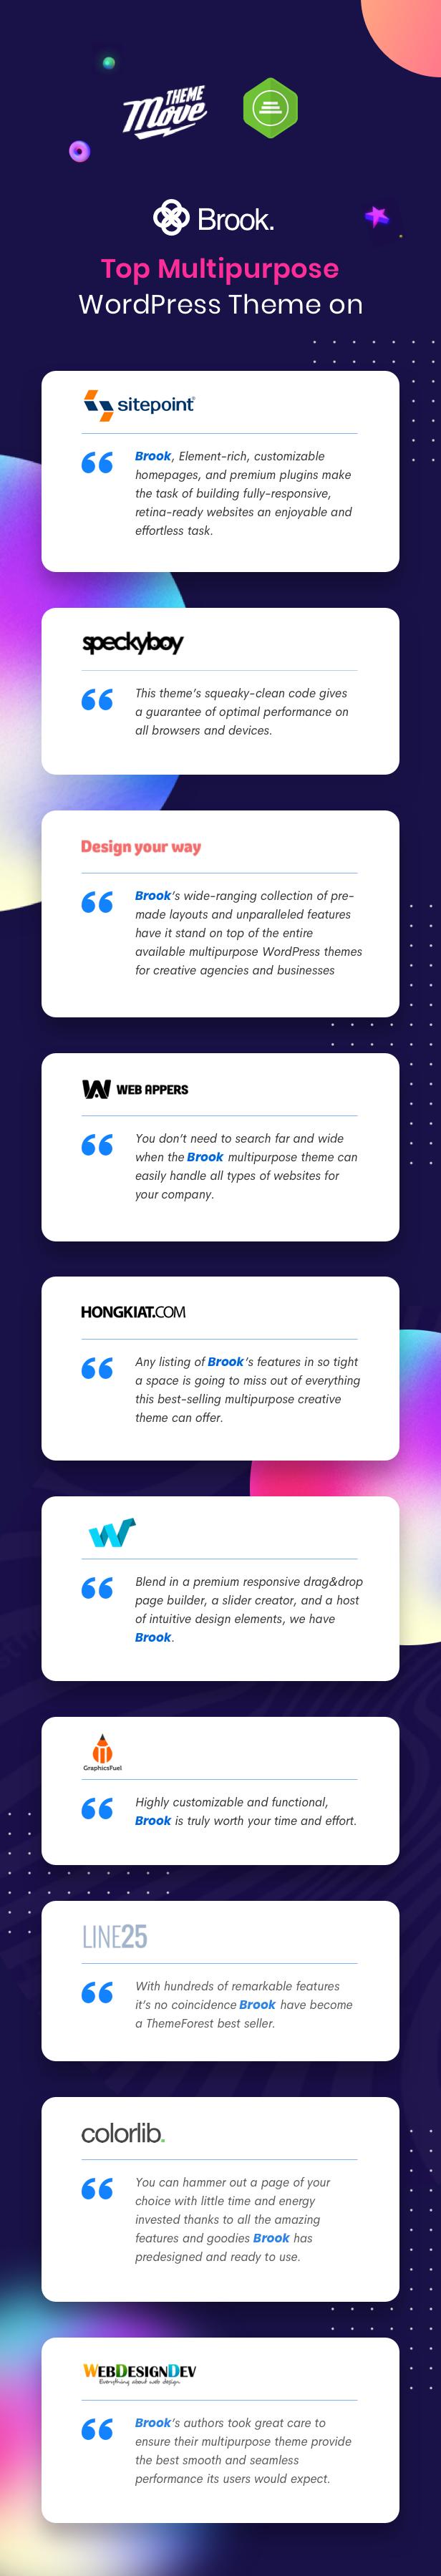 Business Agency WordPress Theme - Review